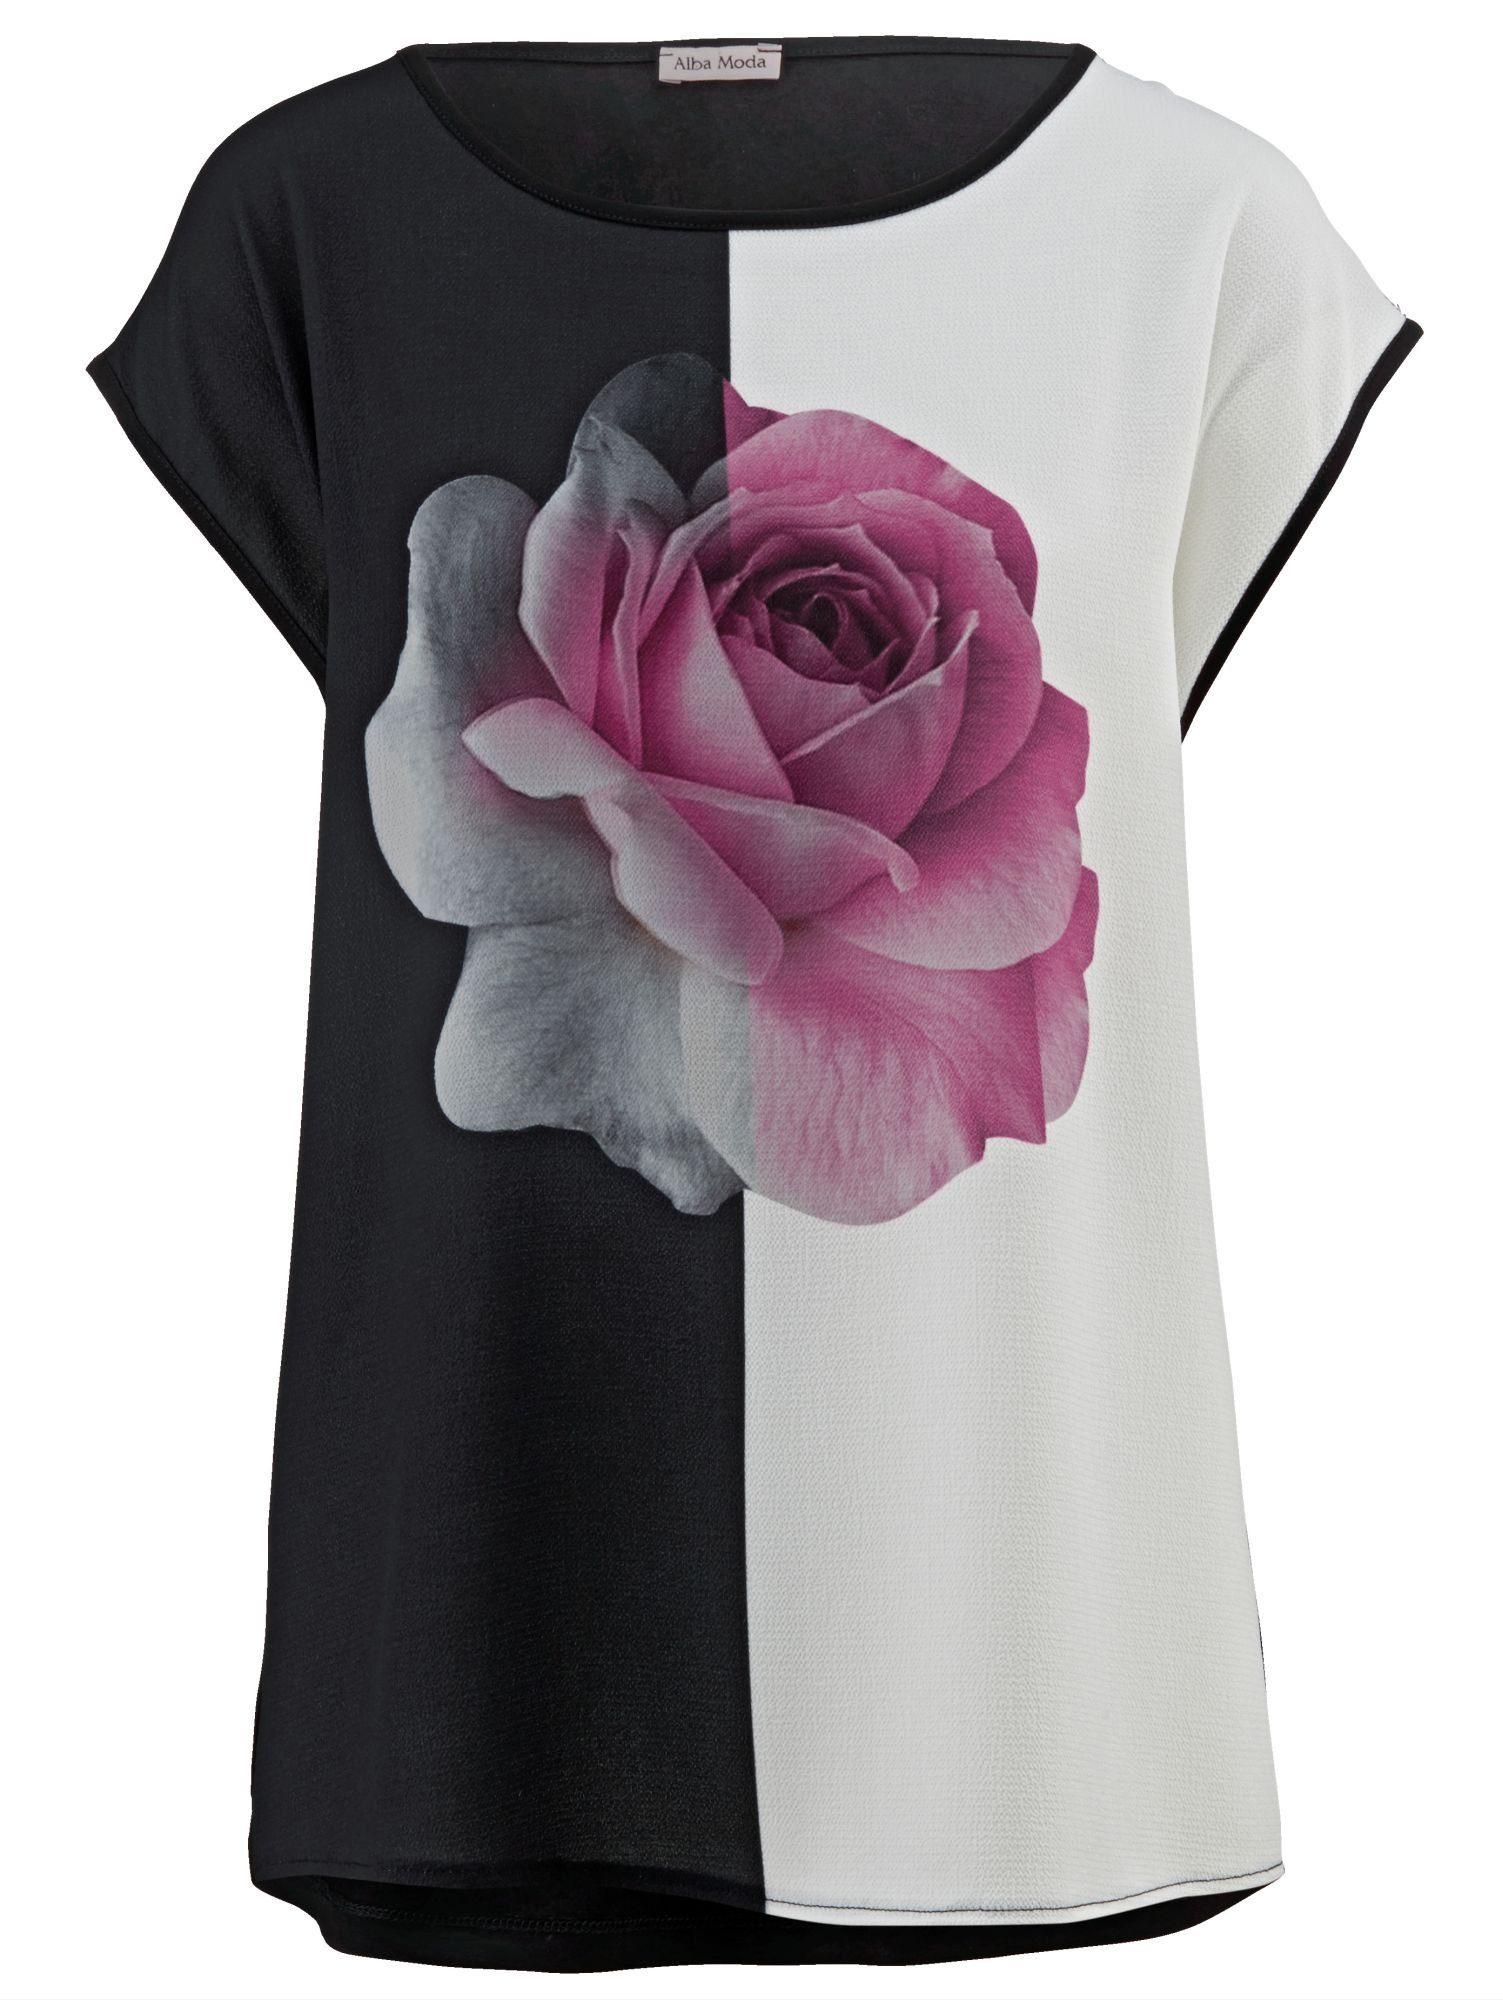 Alba Moda Shirt mit Blumendruck